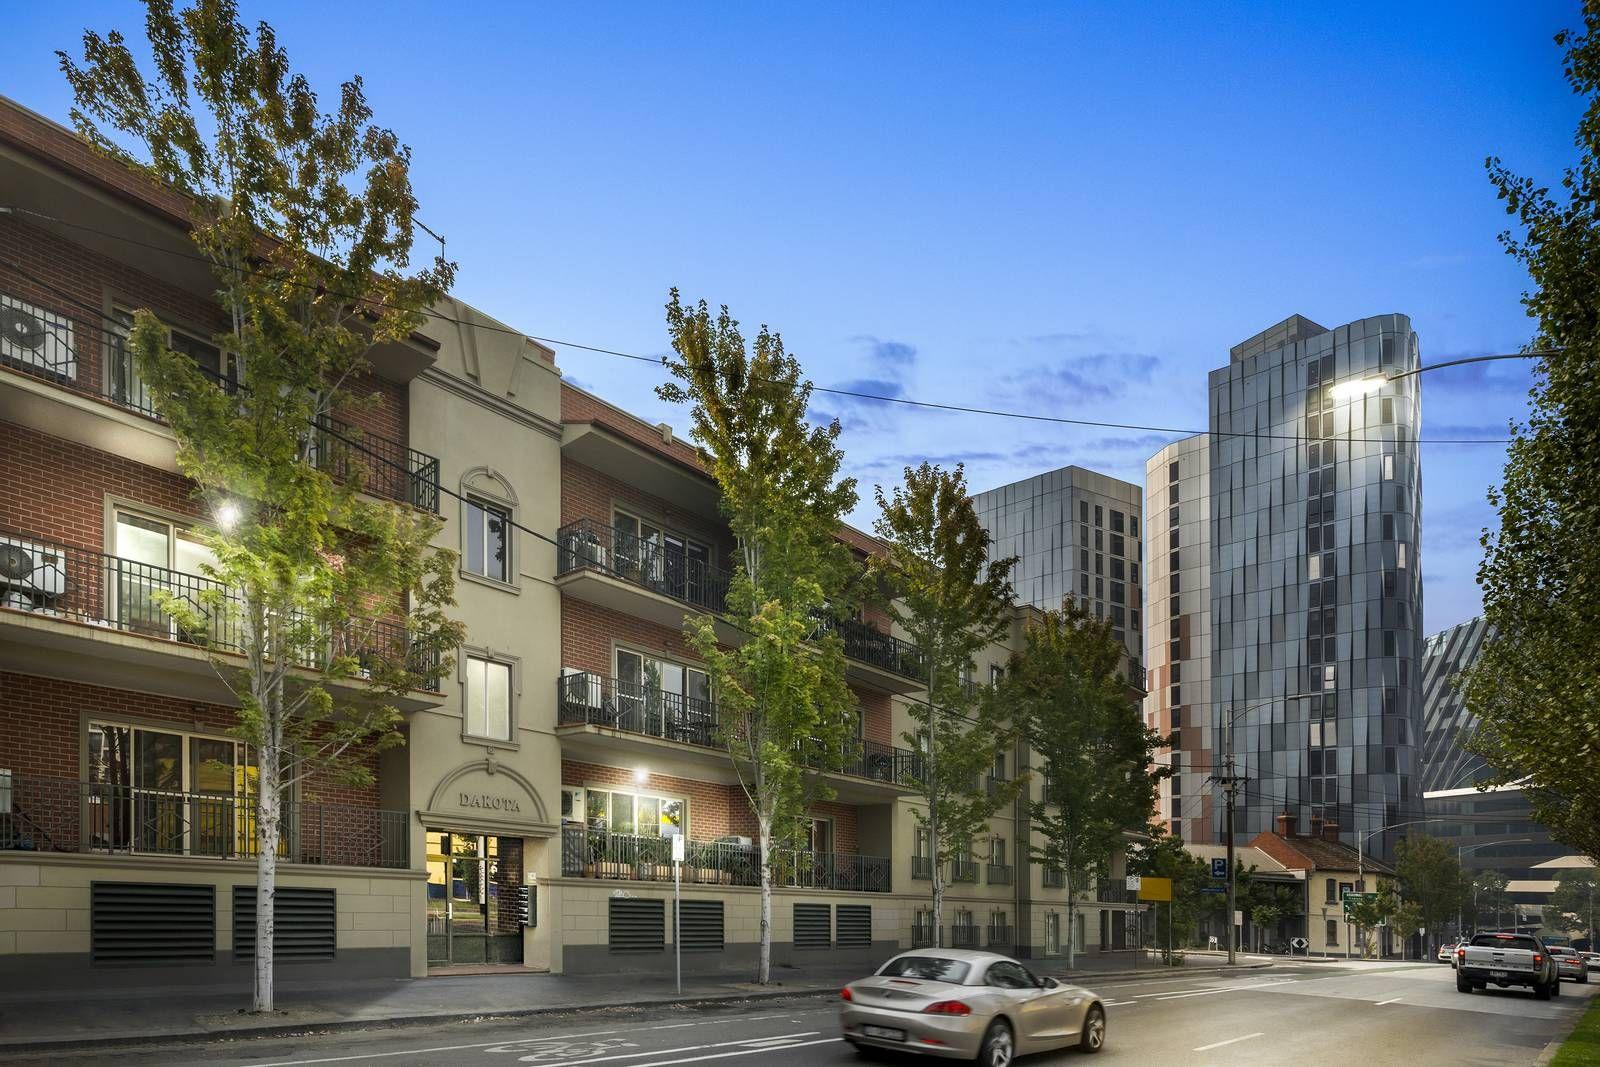 4/231 Peel Street, North Melbourne VIC 3051, Image 0